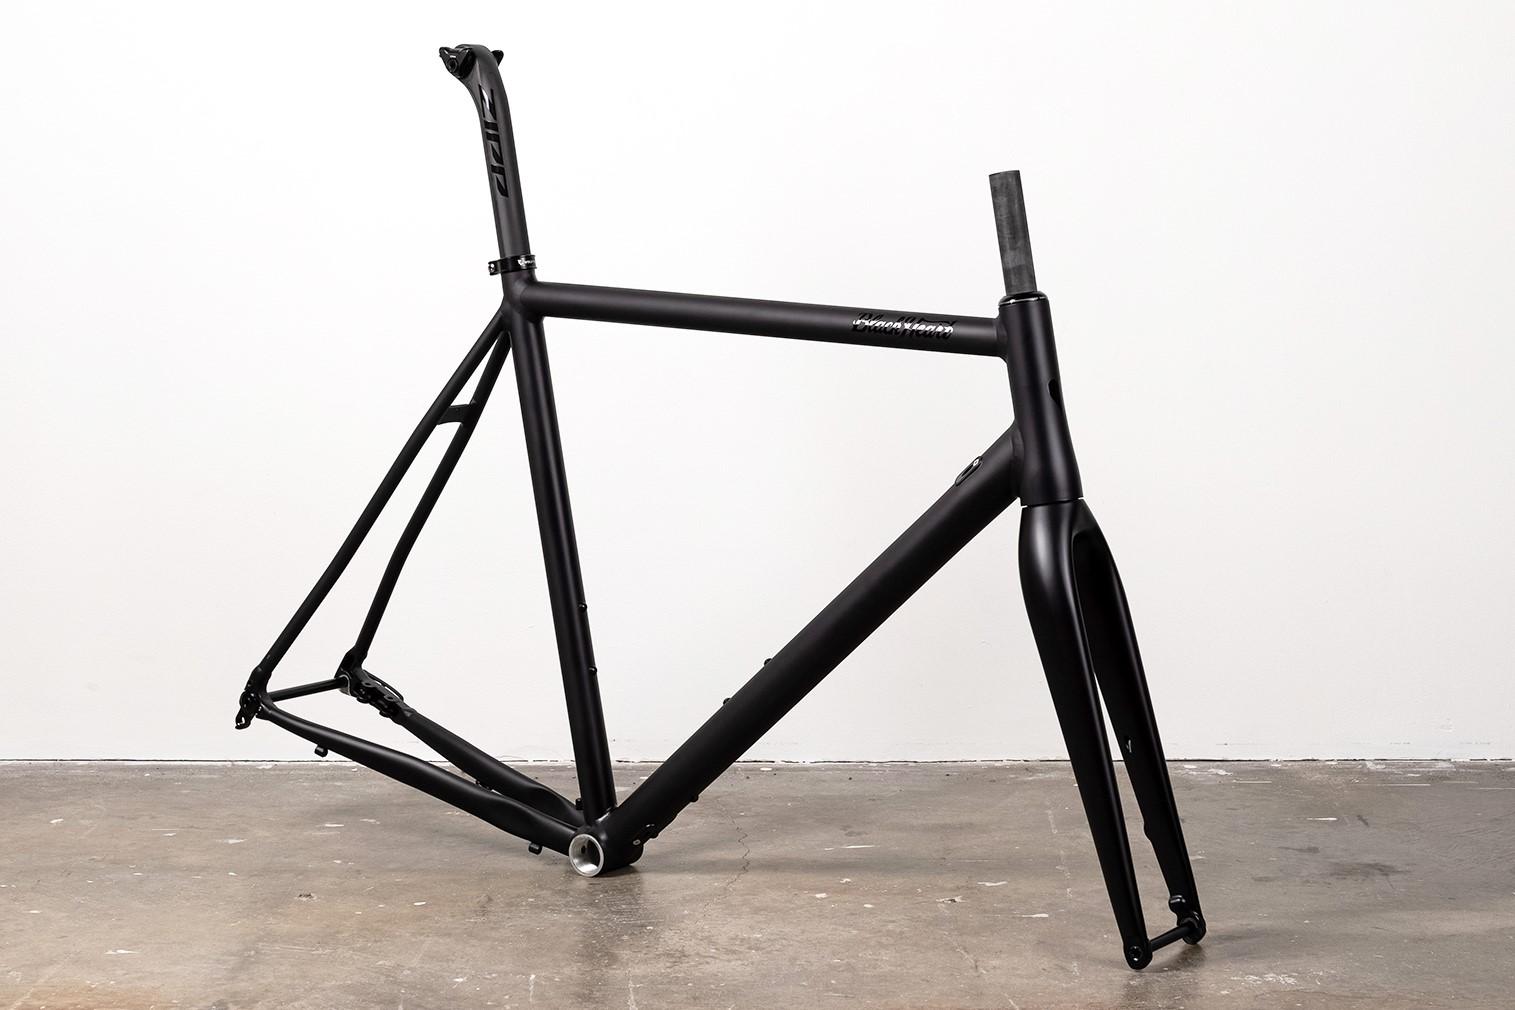 The BlackHeart Allroad aluminum retains Ti version's versatility, cuts price